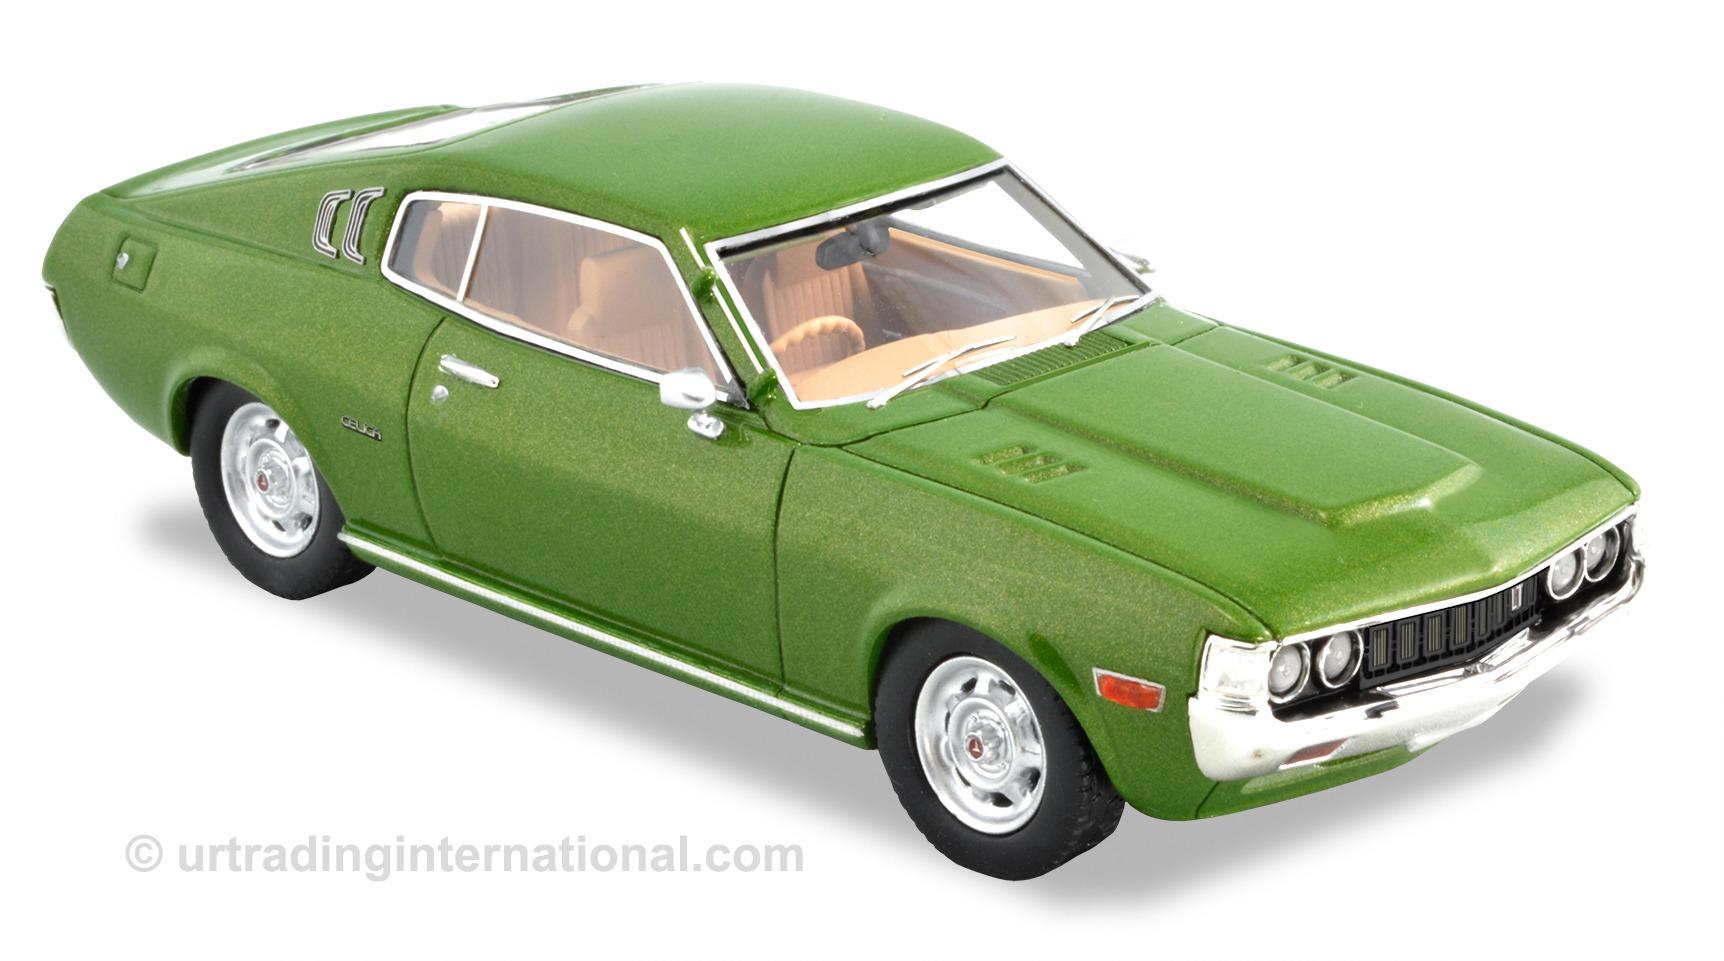 1977 Toyota Celica LT2000 – Green